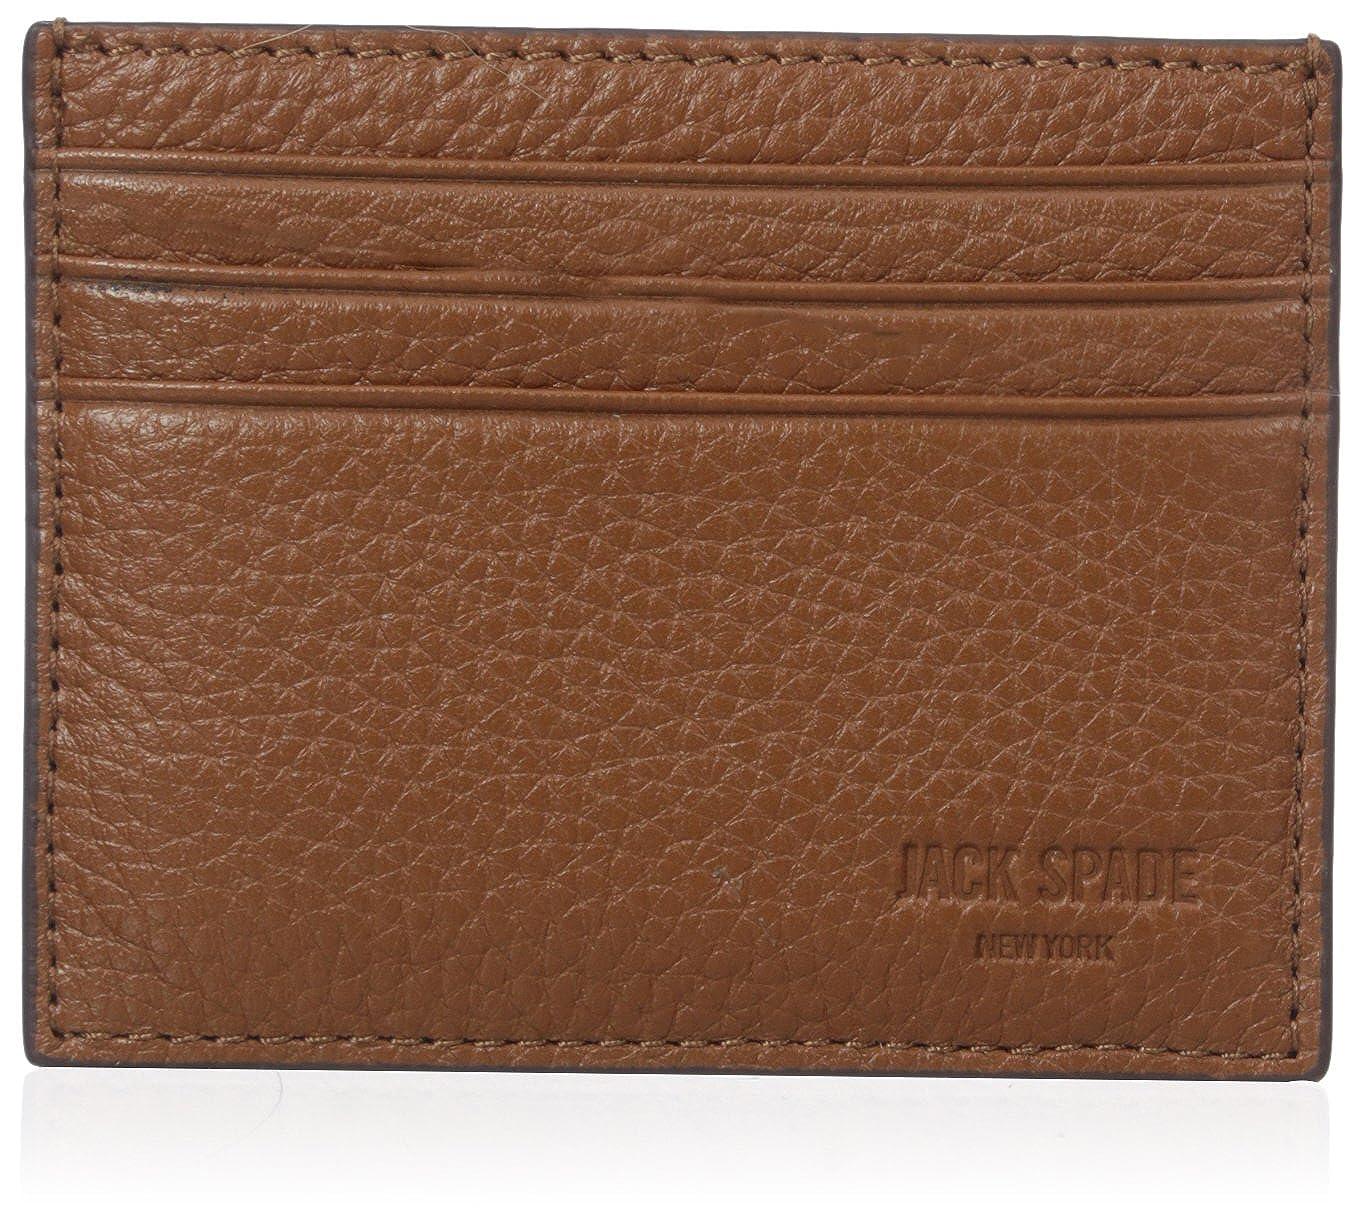 Jack Spade Men's Pebble Leather 6 Card Holder W6RU0396